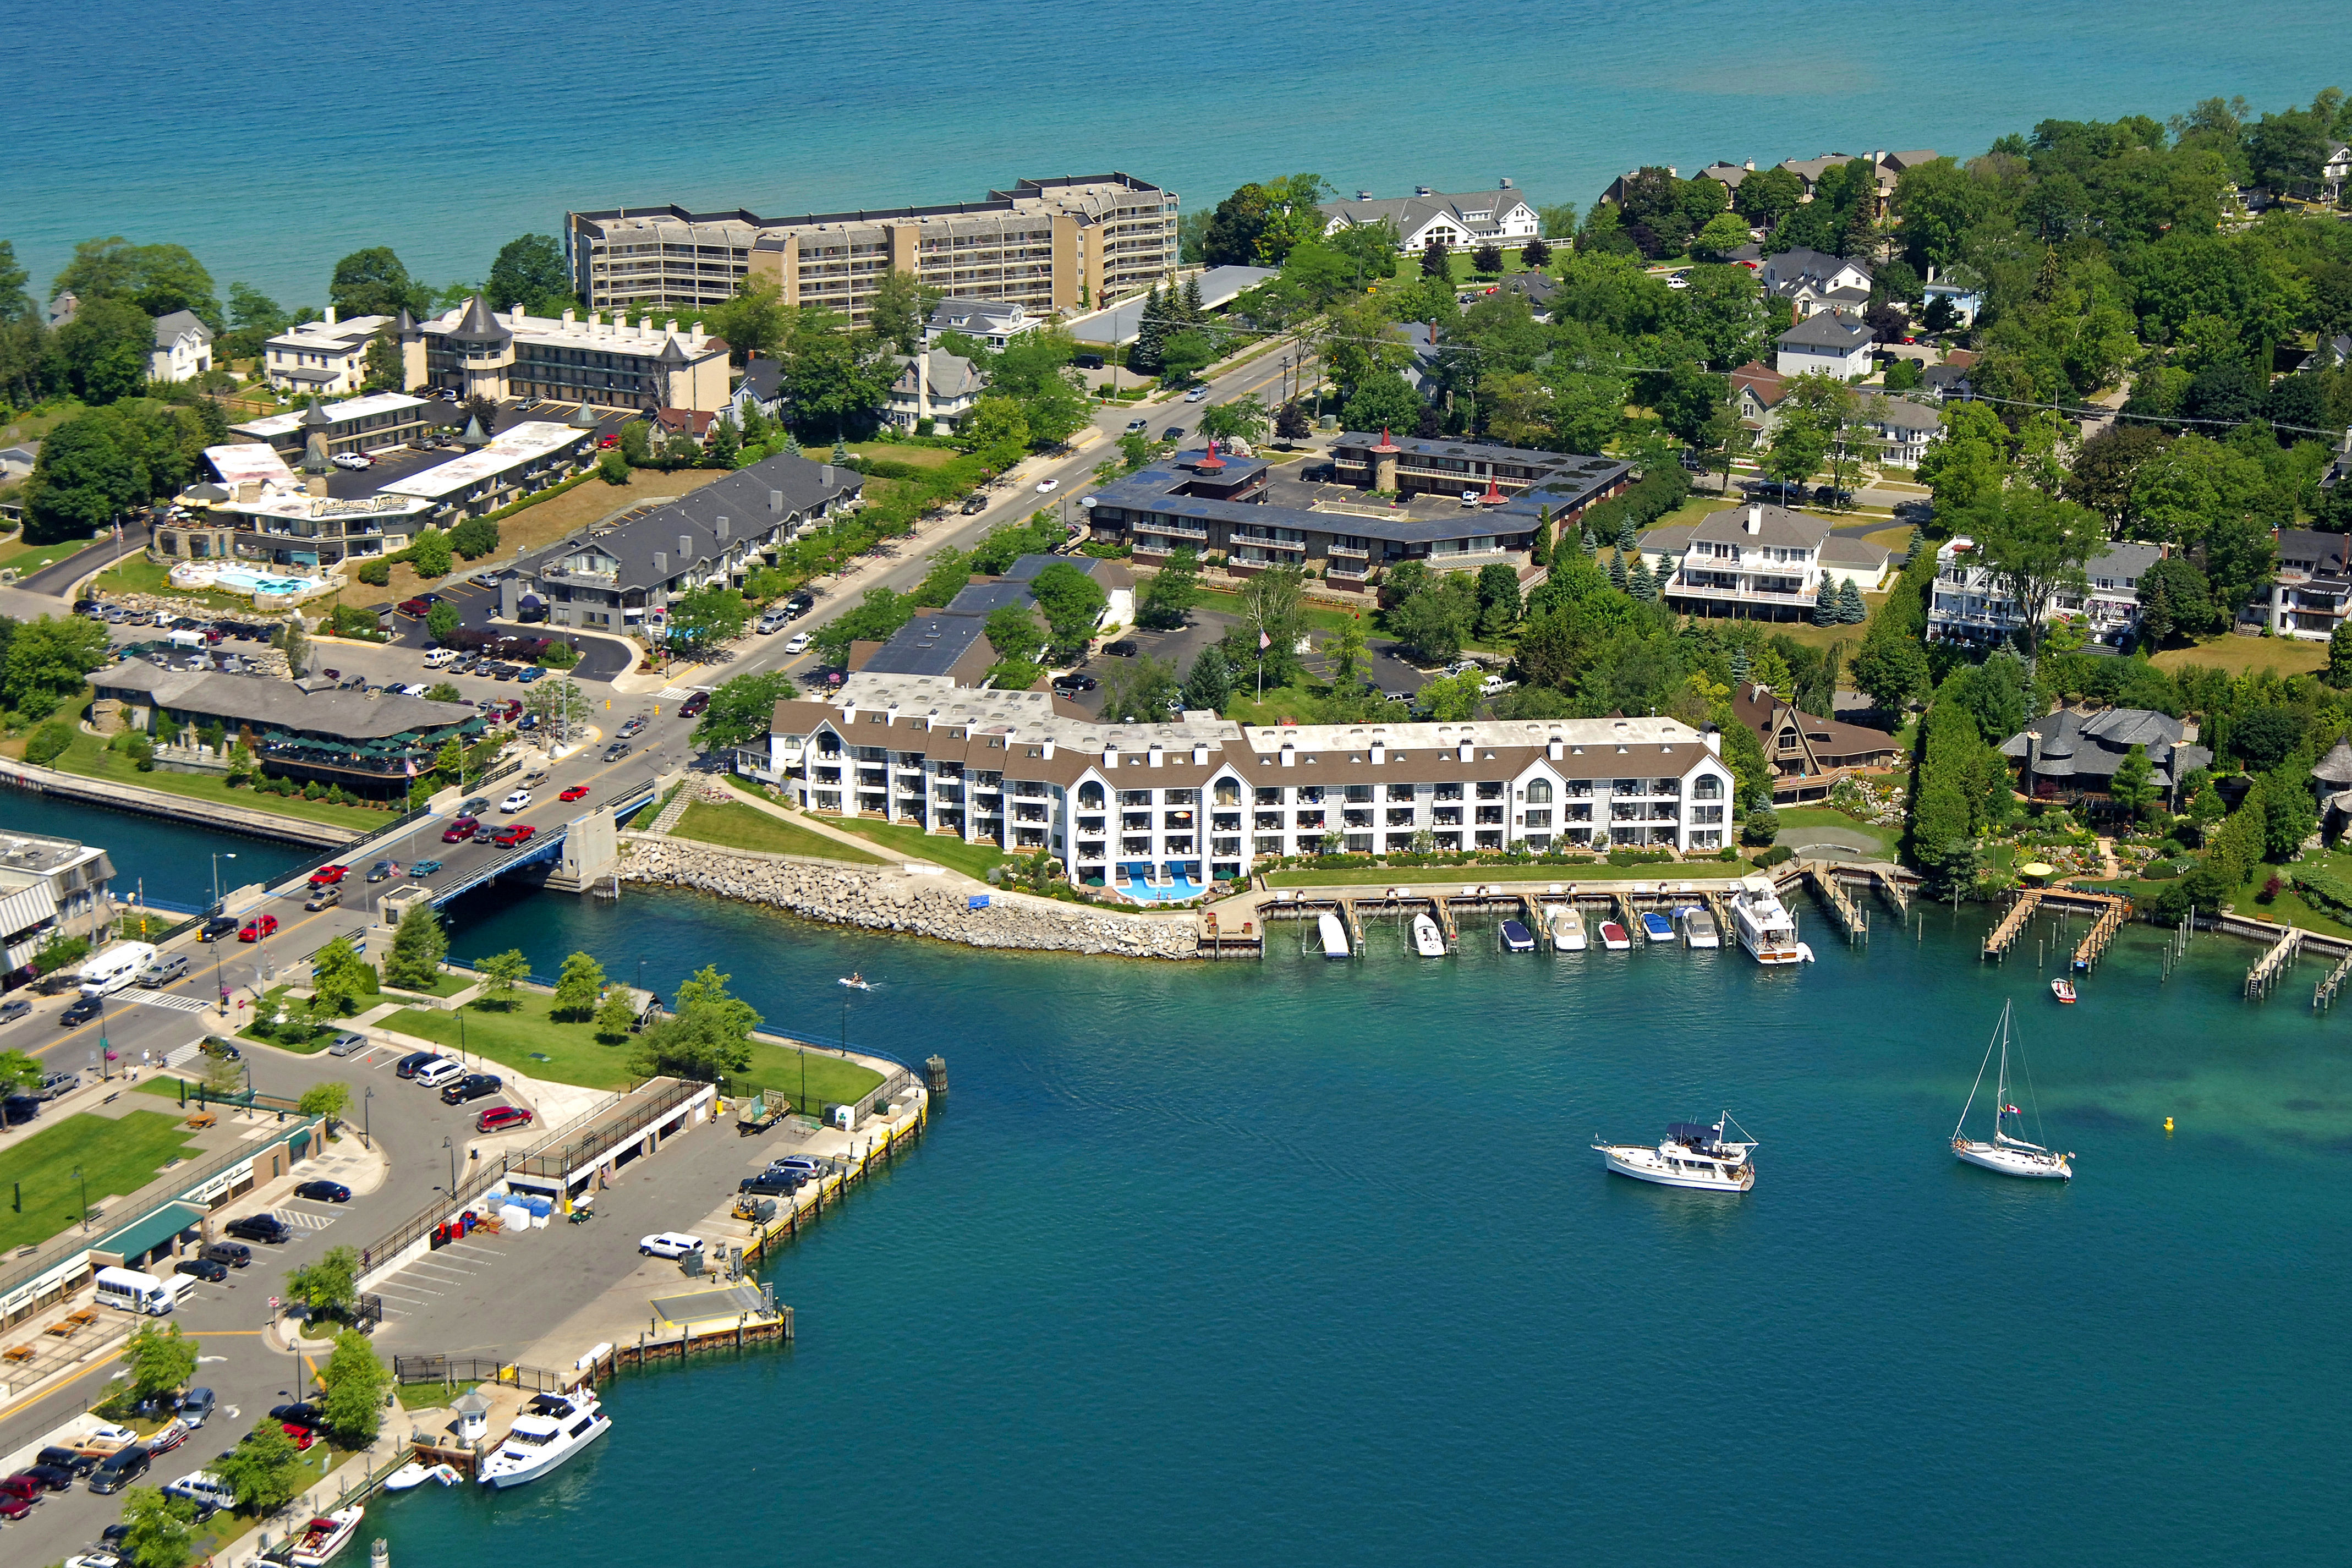 Edgewater Inn Amp Marina In Charlevoix Mi United States